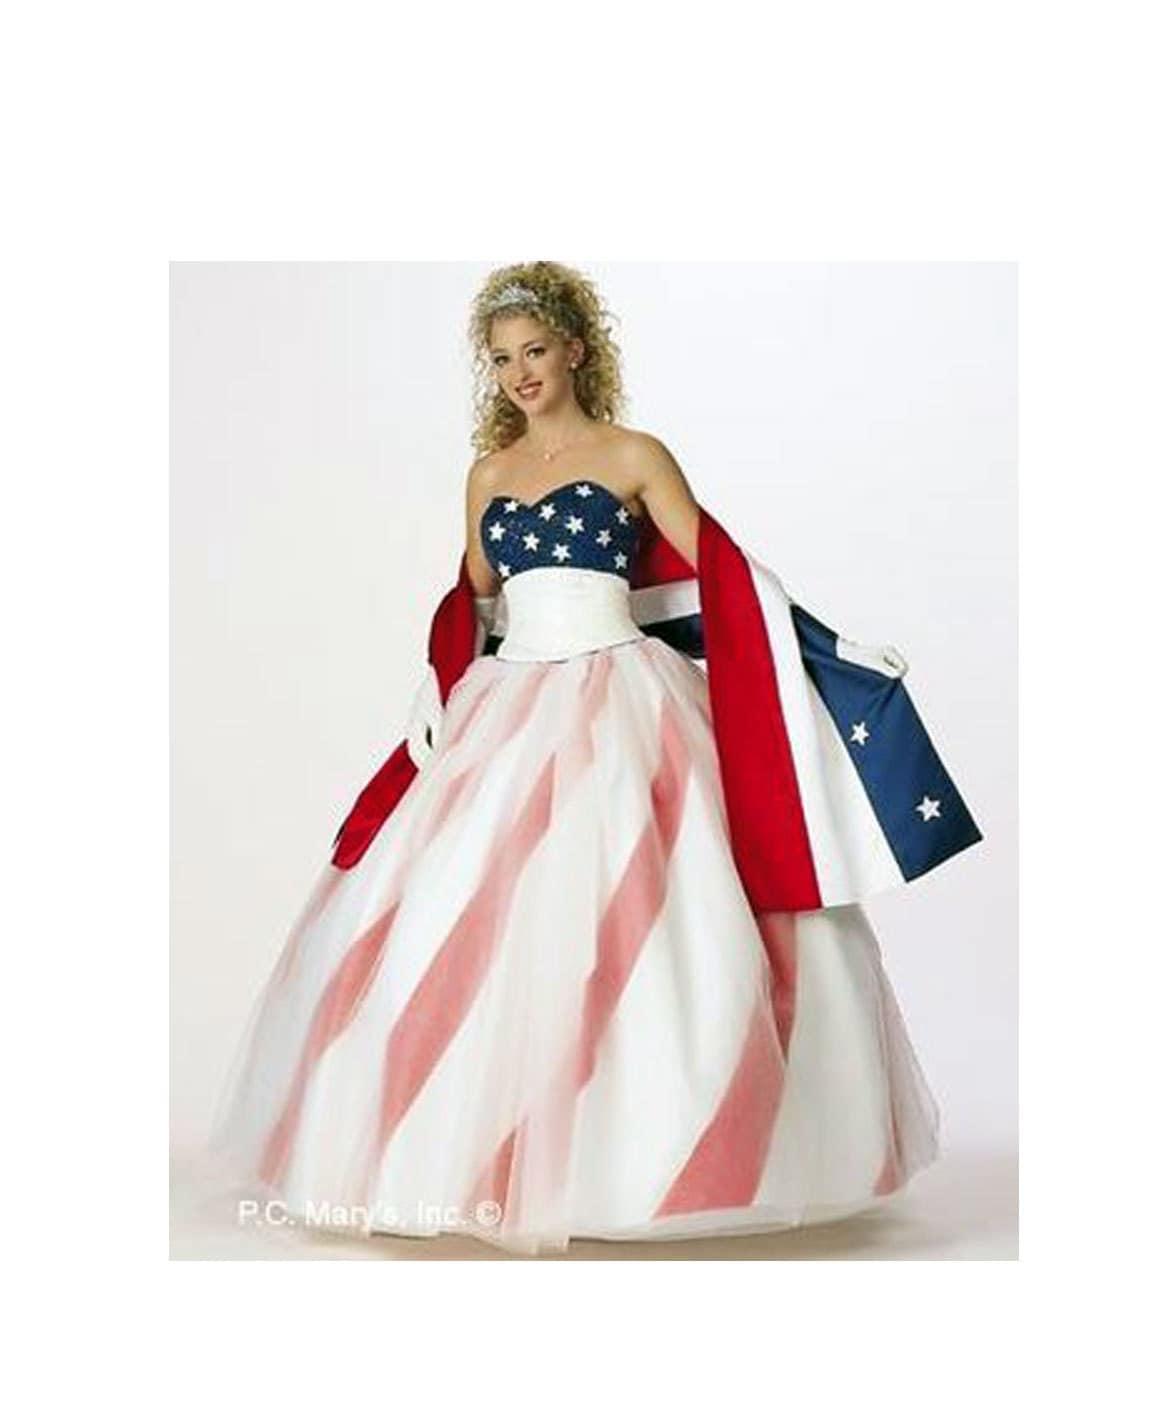 Pageant RWB American flag Dress USA Flag dress Patriotic gown